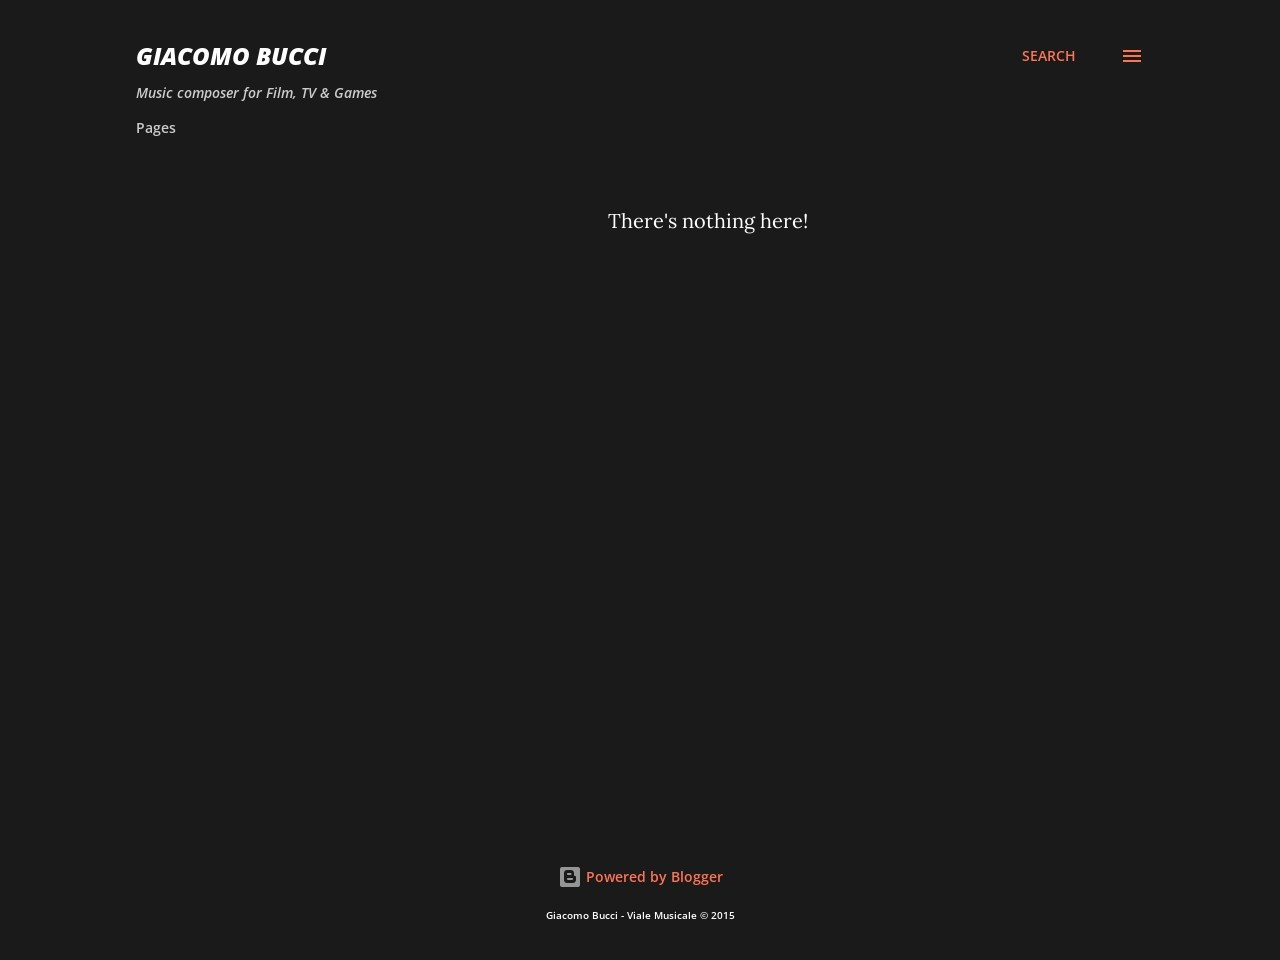 giacomo-bucci-blog